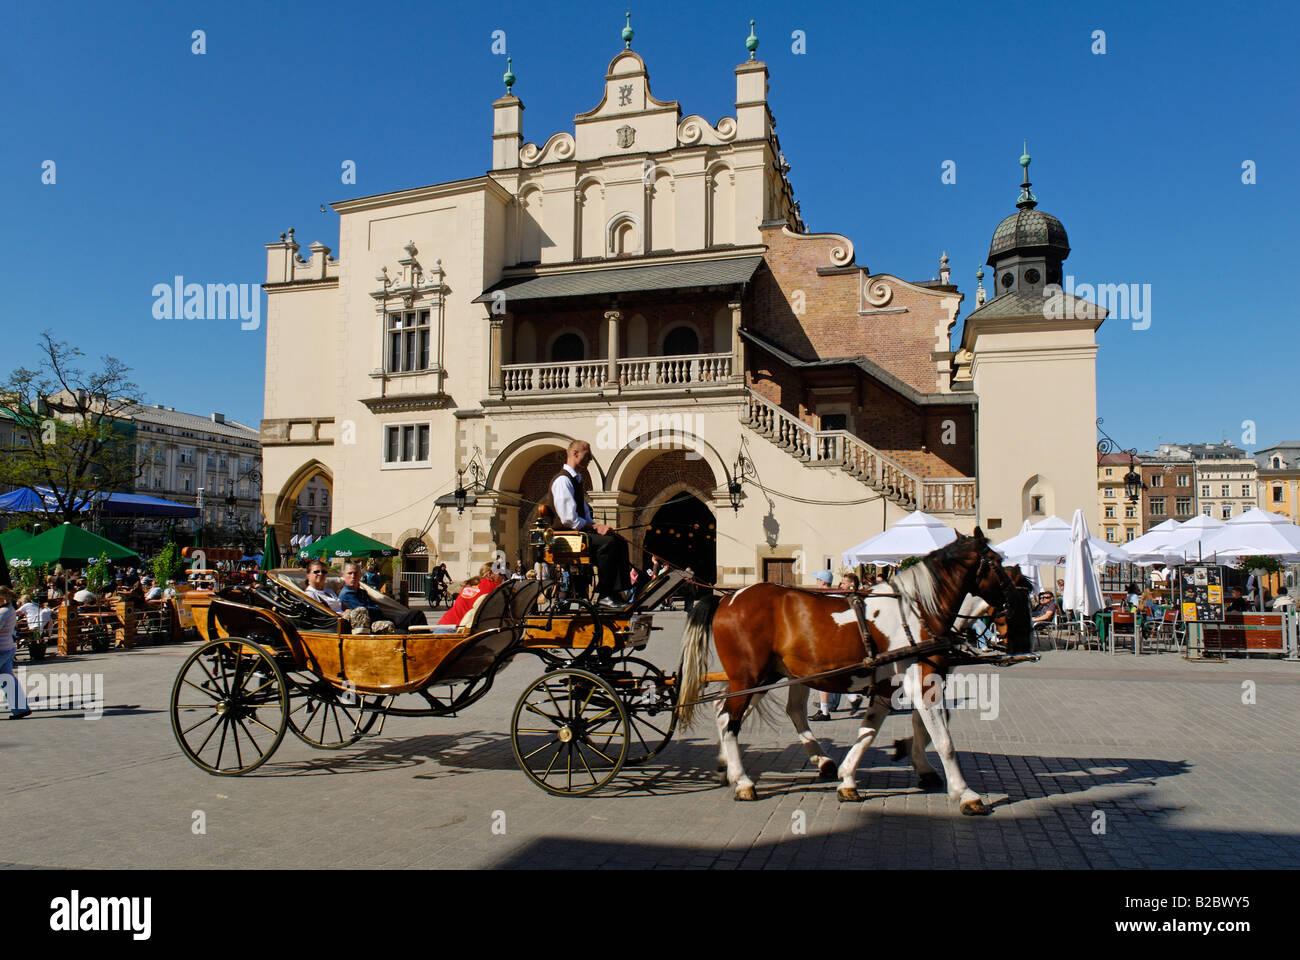 Cloth Hall, Drapers' Hall, Sukiennice on the main market square, Rynek, of Krakow, Poland, Europe Stock Photo